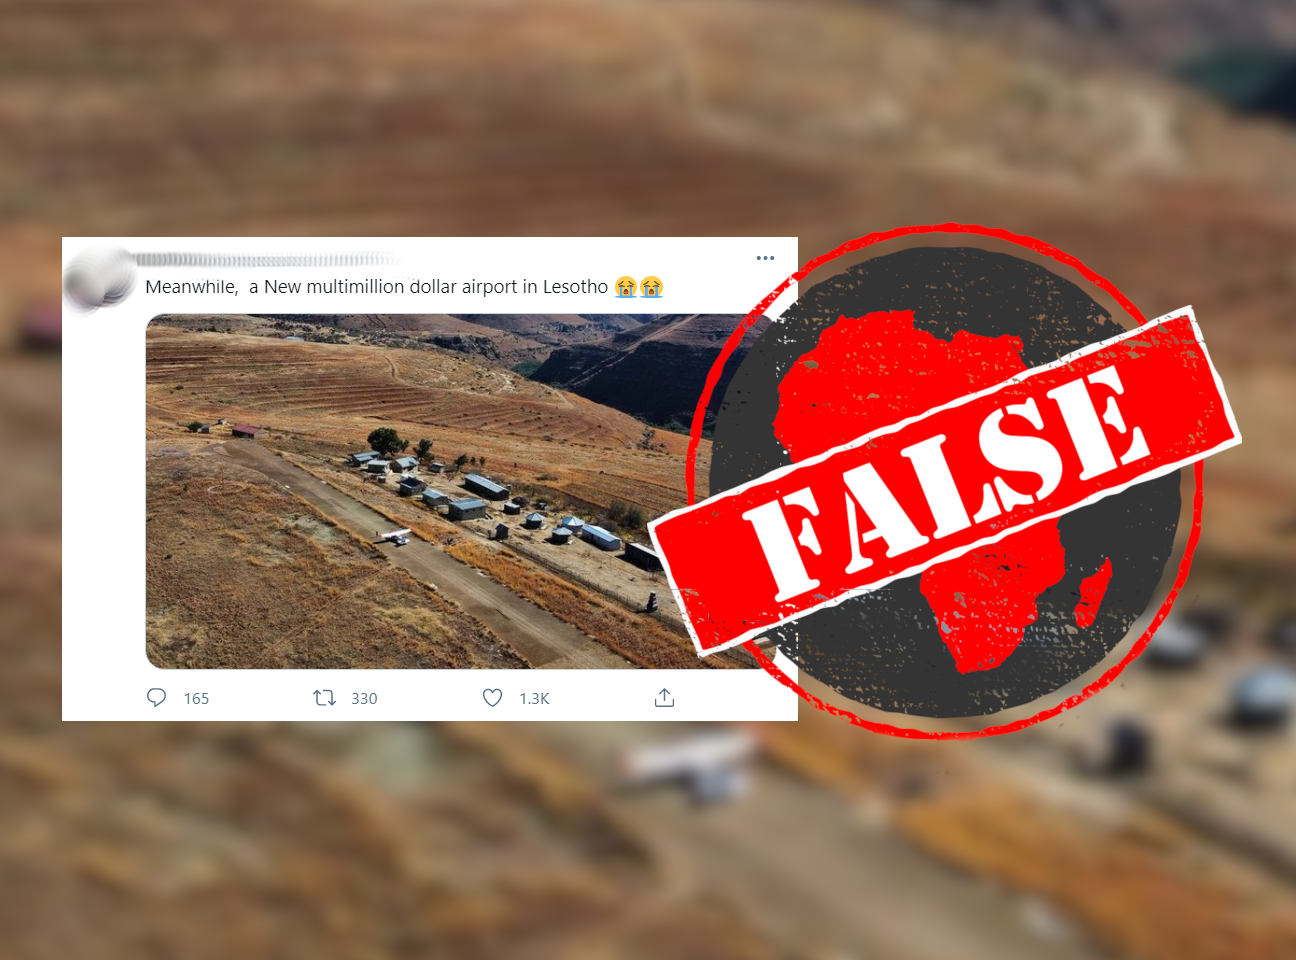 Airport_false